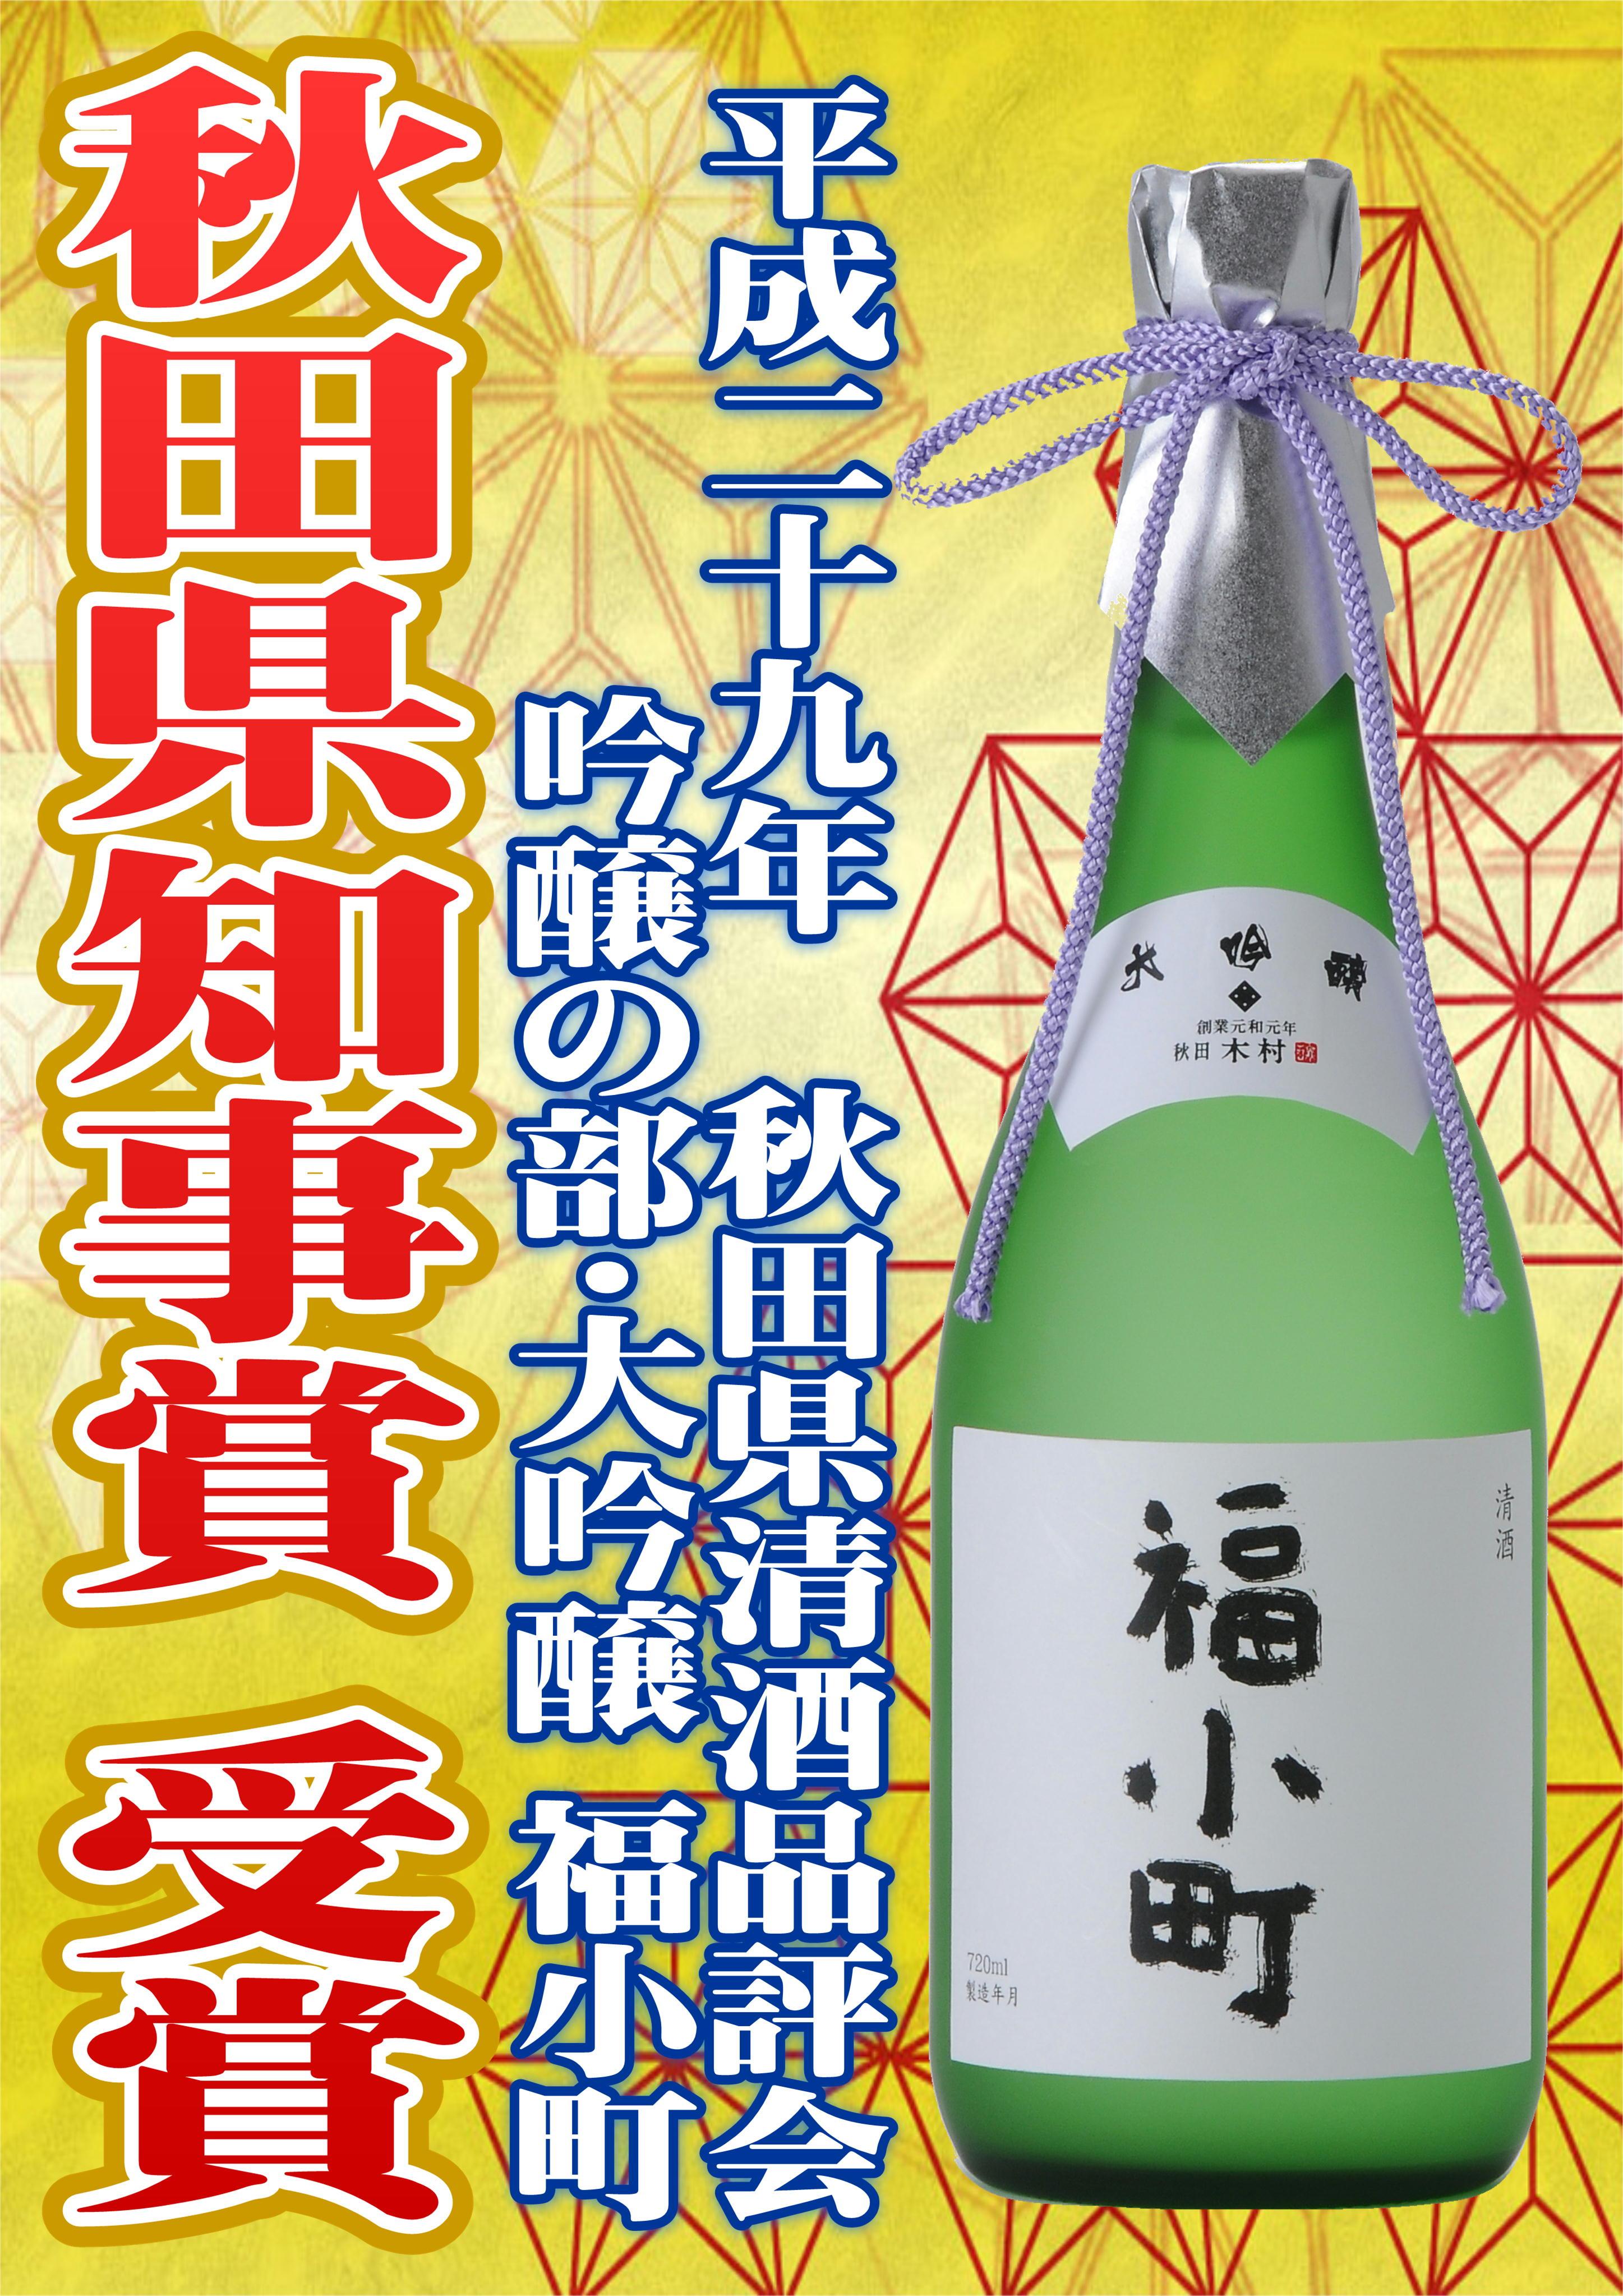 http://www.fukukomachi.com/blog/photo/20171102-1.JPG